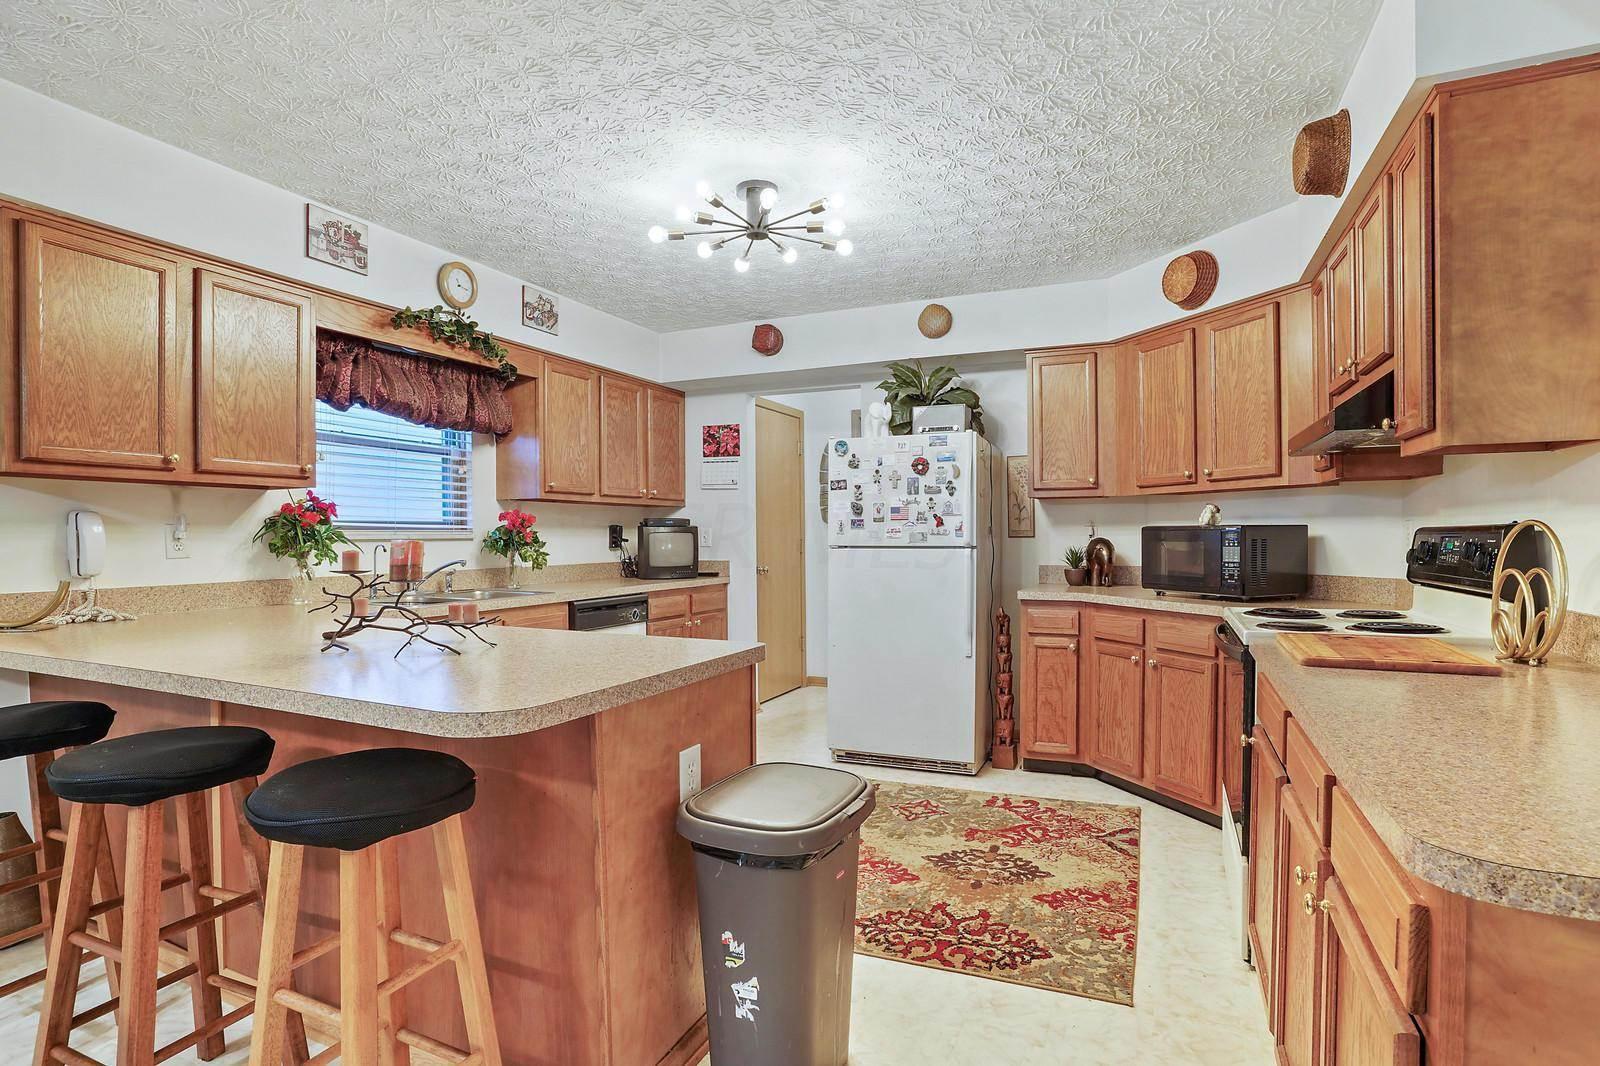 8182 Creekstone Lane, Blacklick, OH 43004